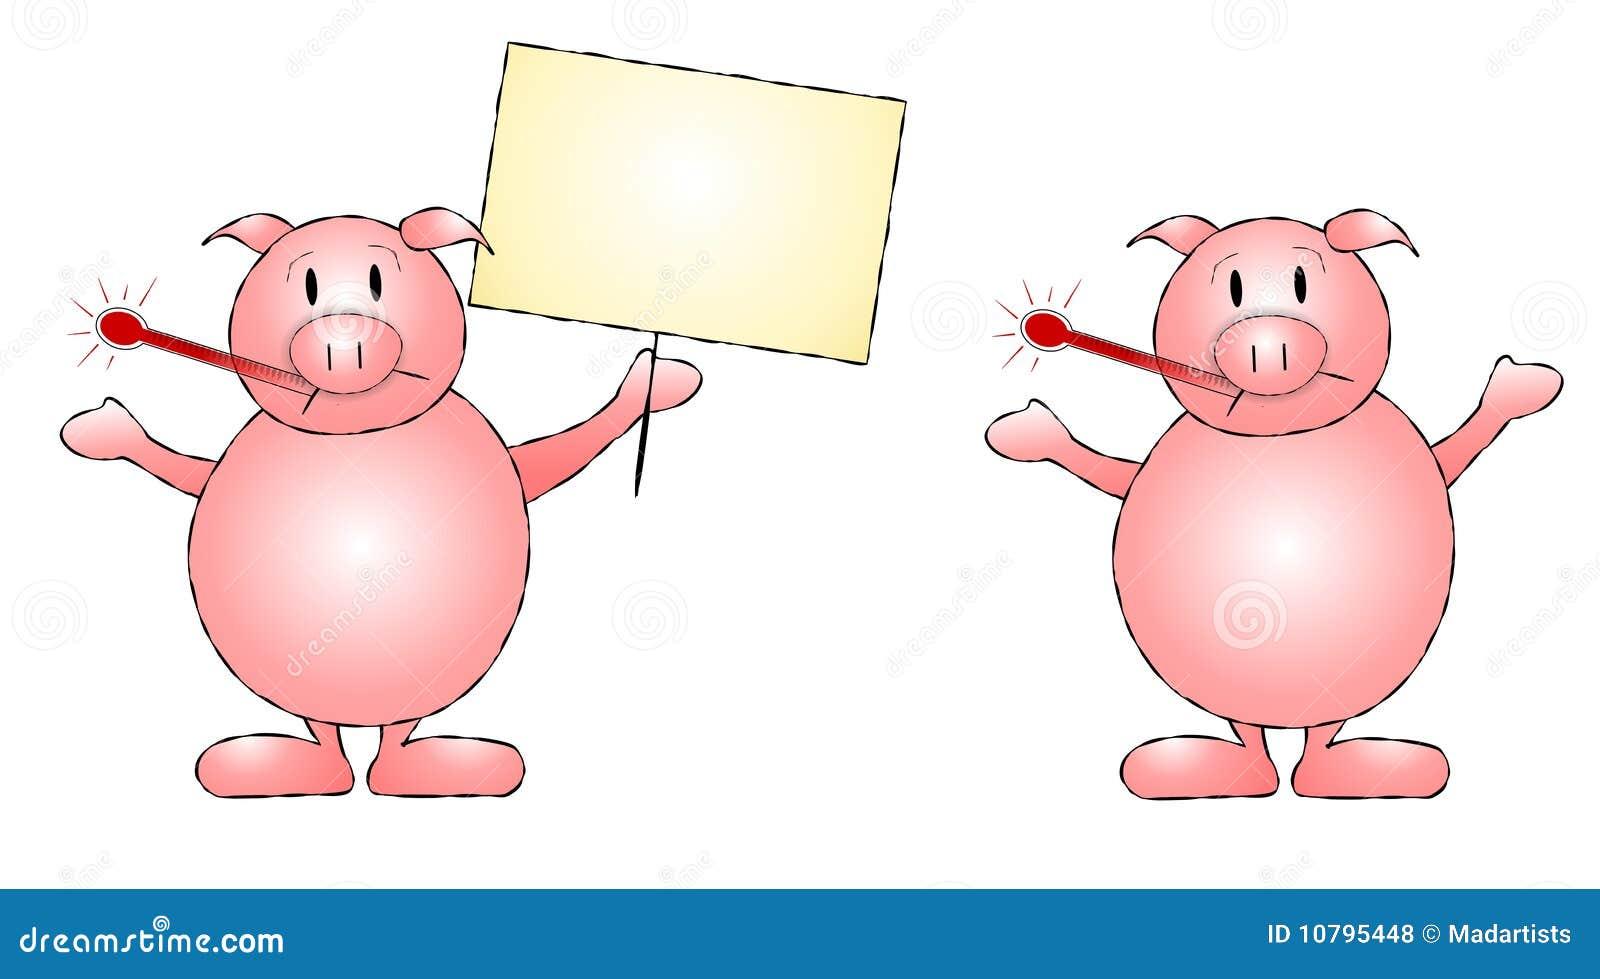 Swine Flu Pigs Clip Art